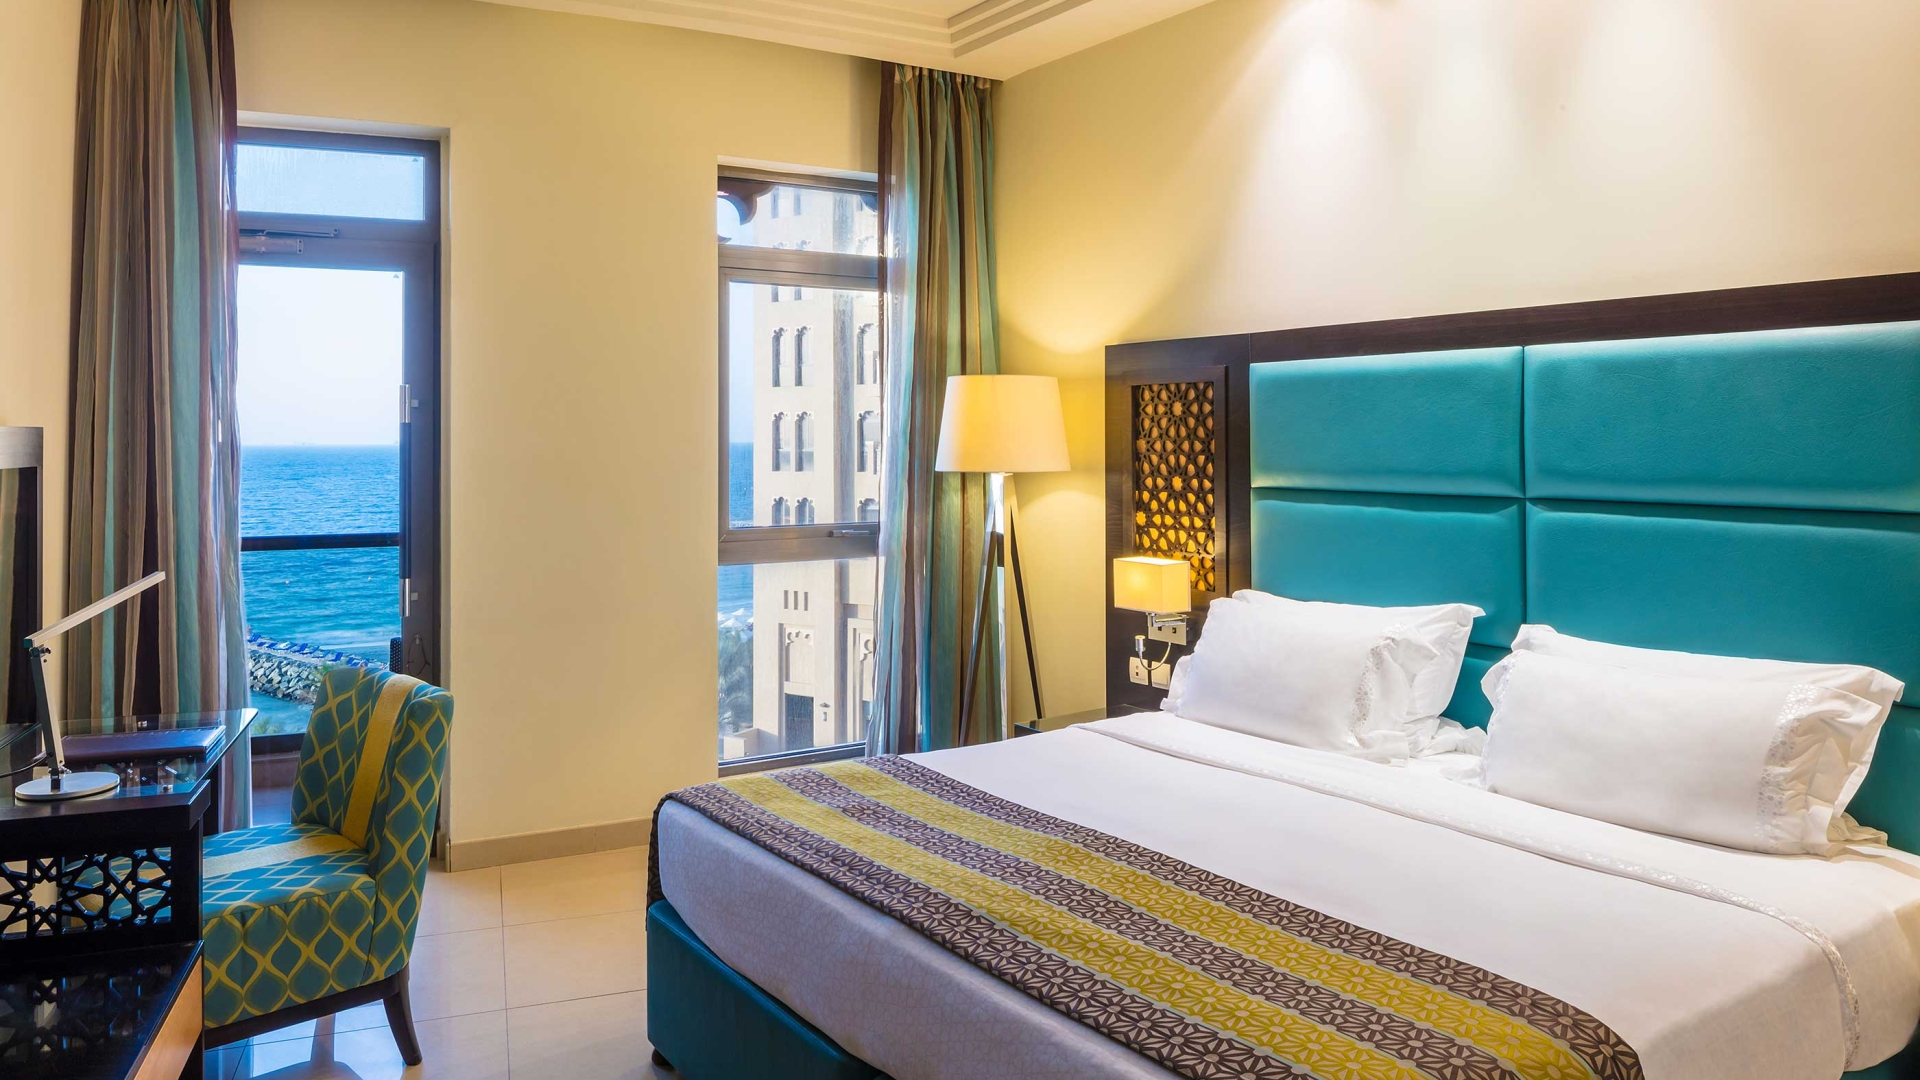 Bahi Ajman Palace Hotel Room